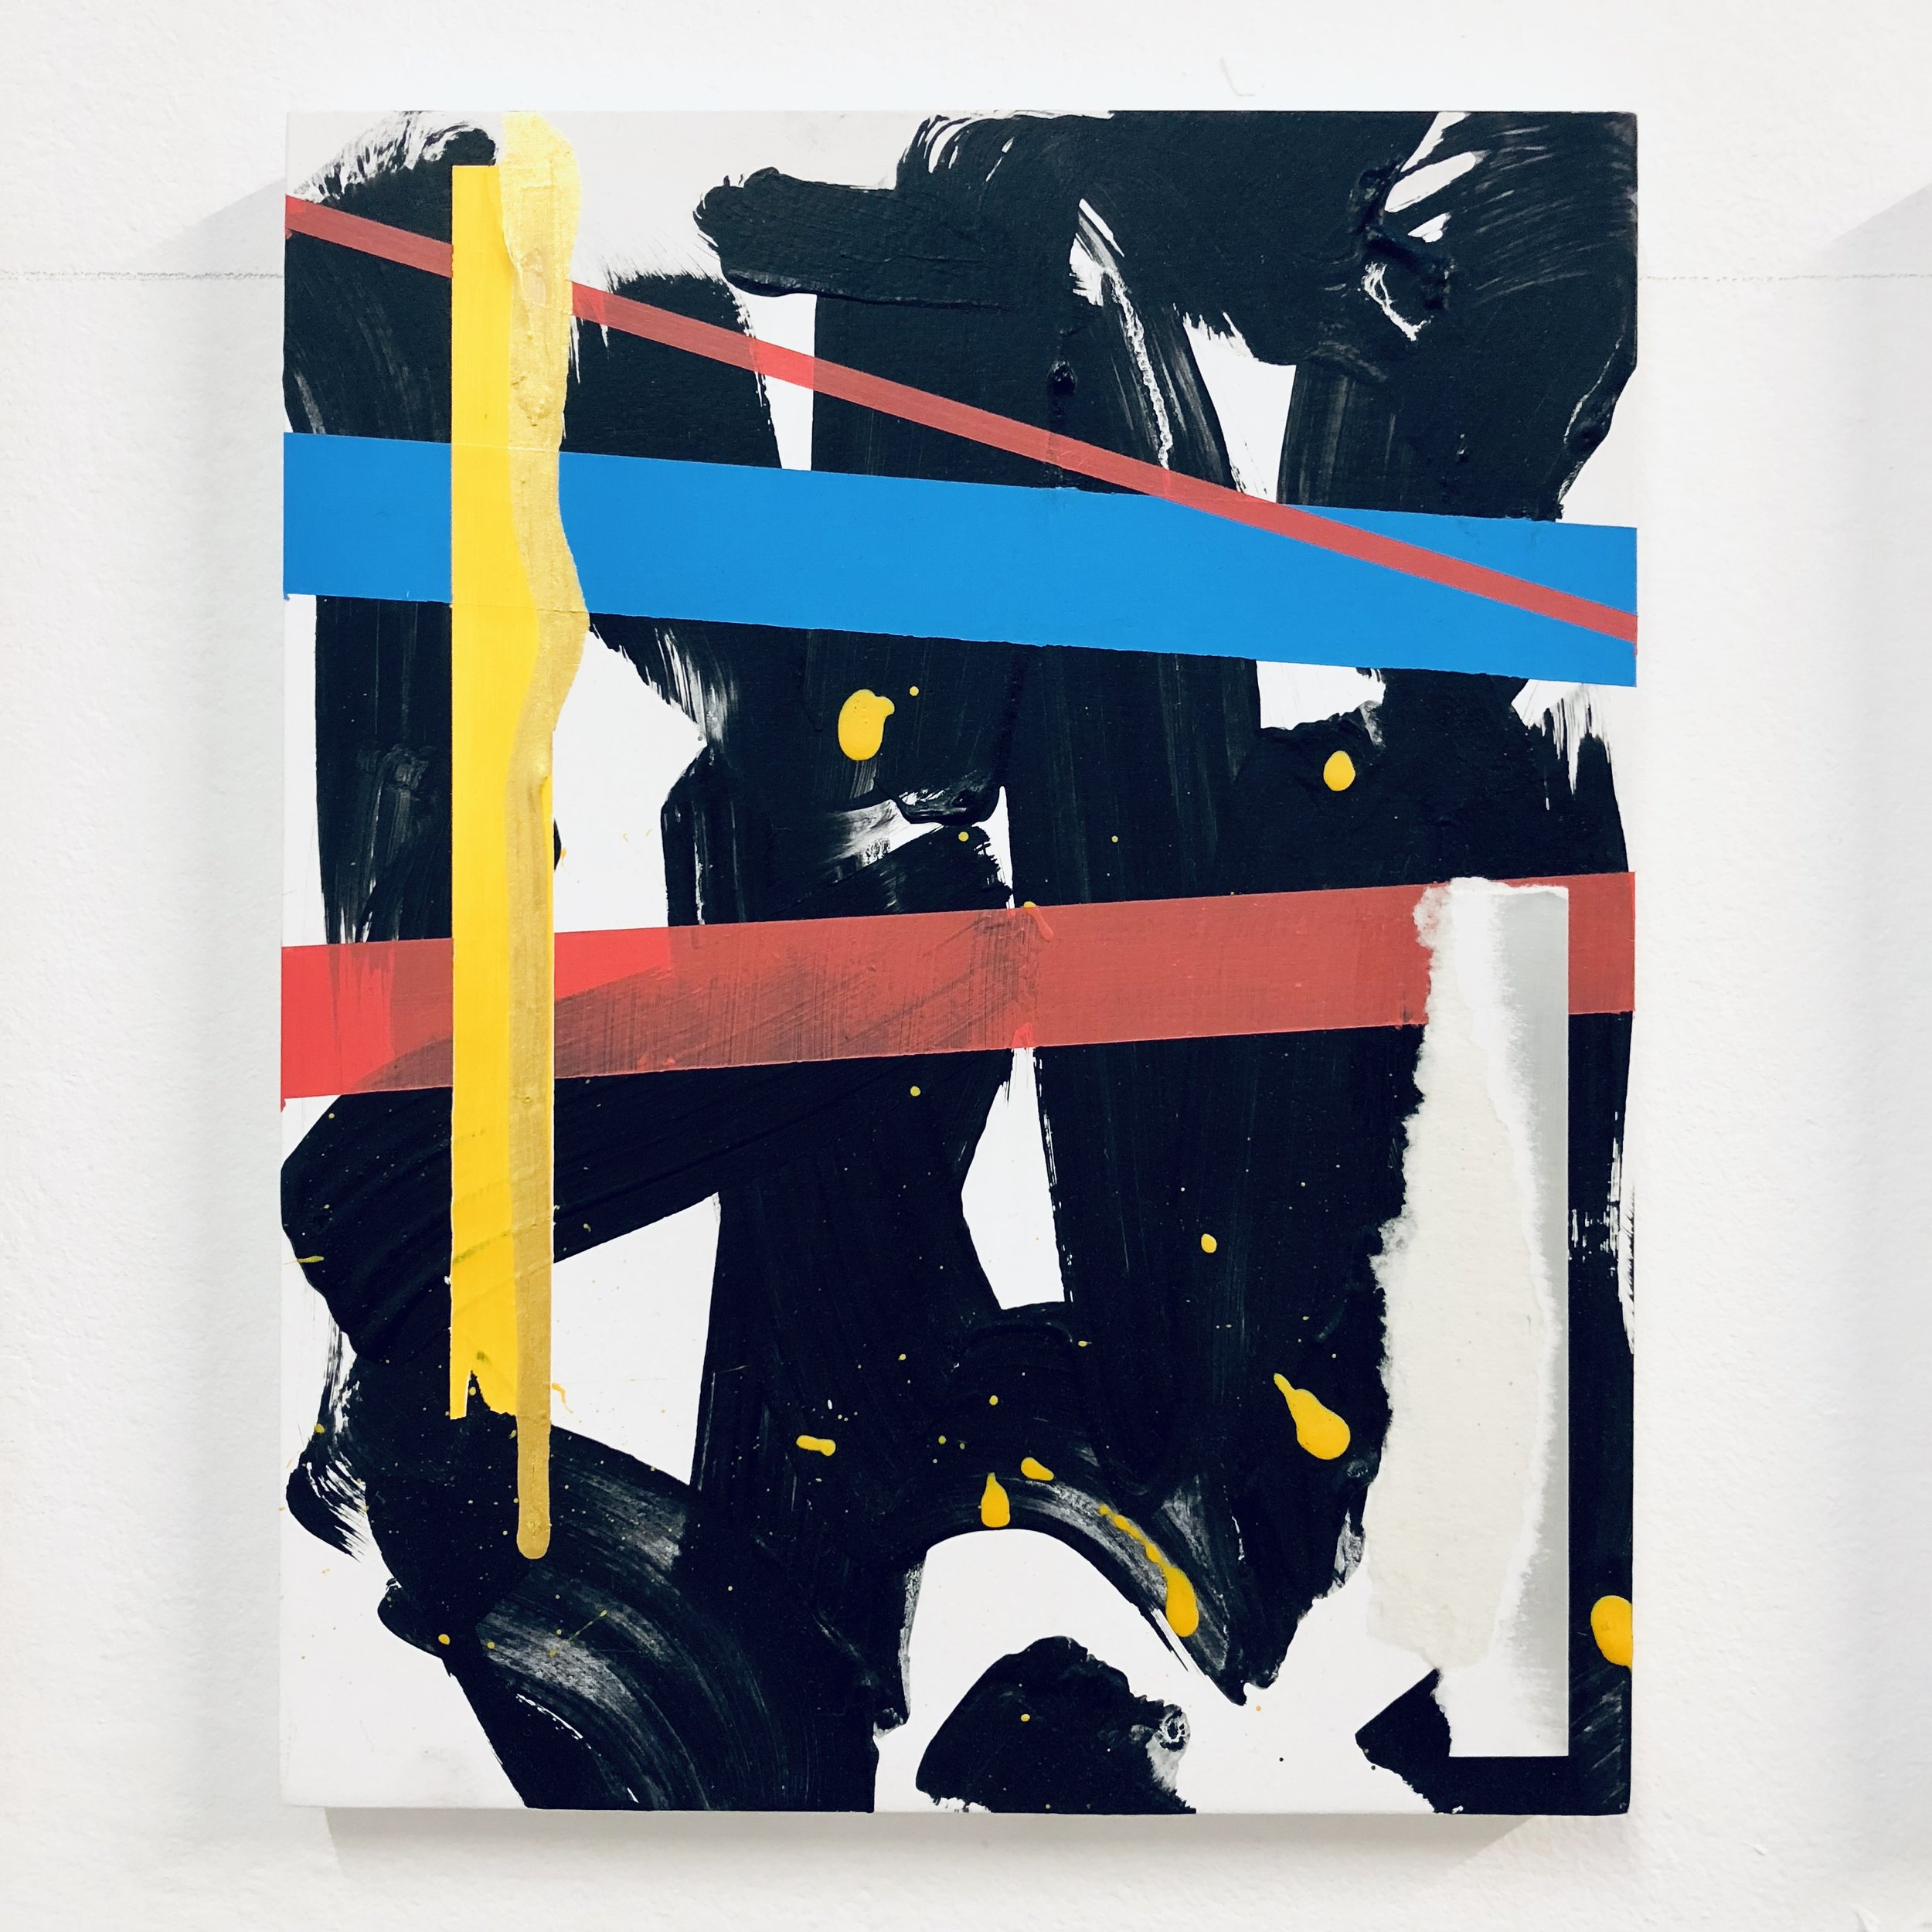 Michal Raz, Love Triangle, Mixed Media on Wood, 20 x 25 cm